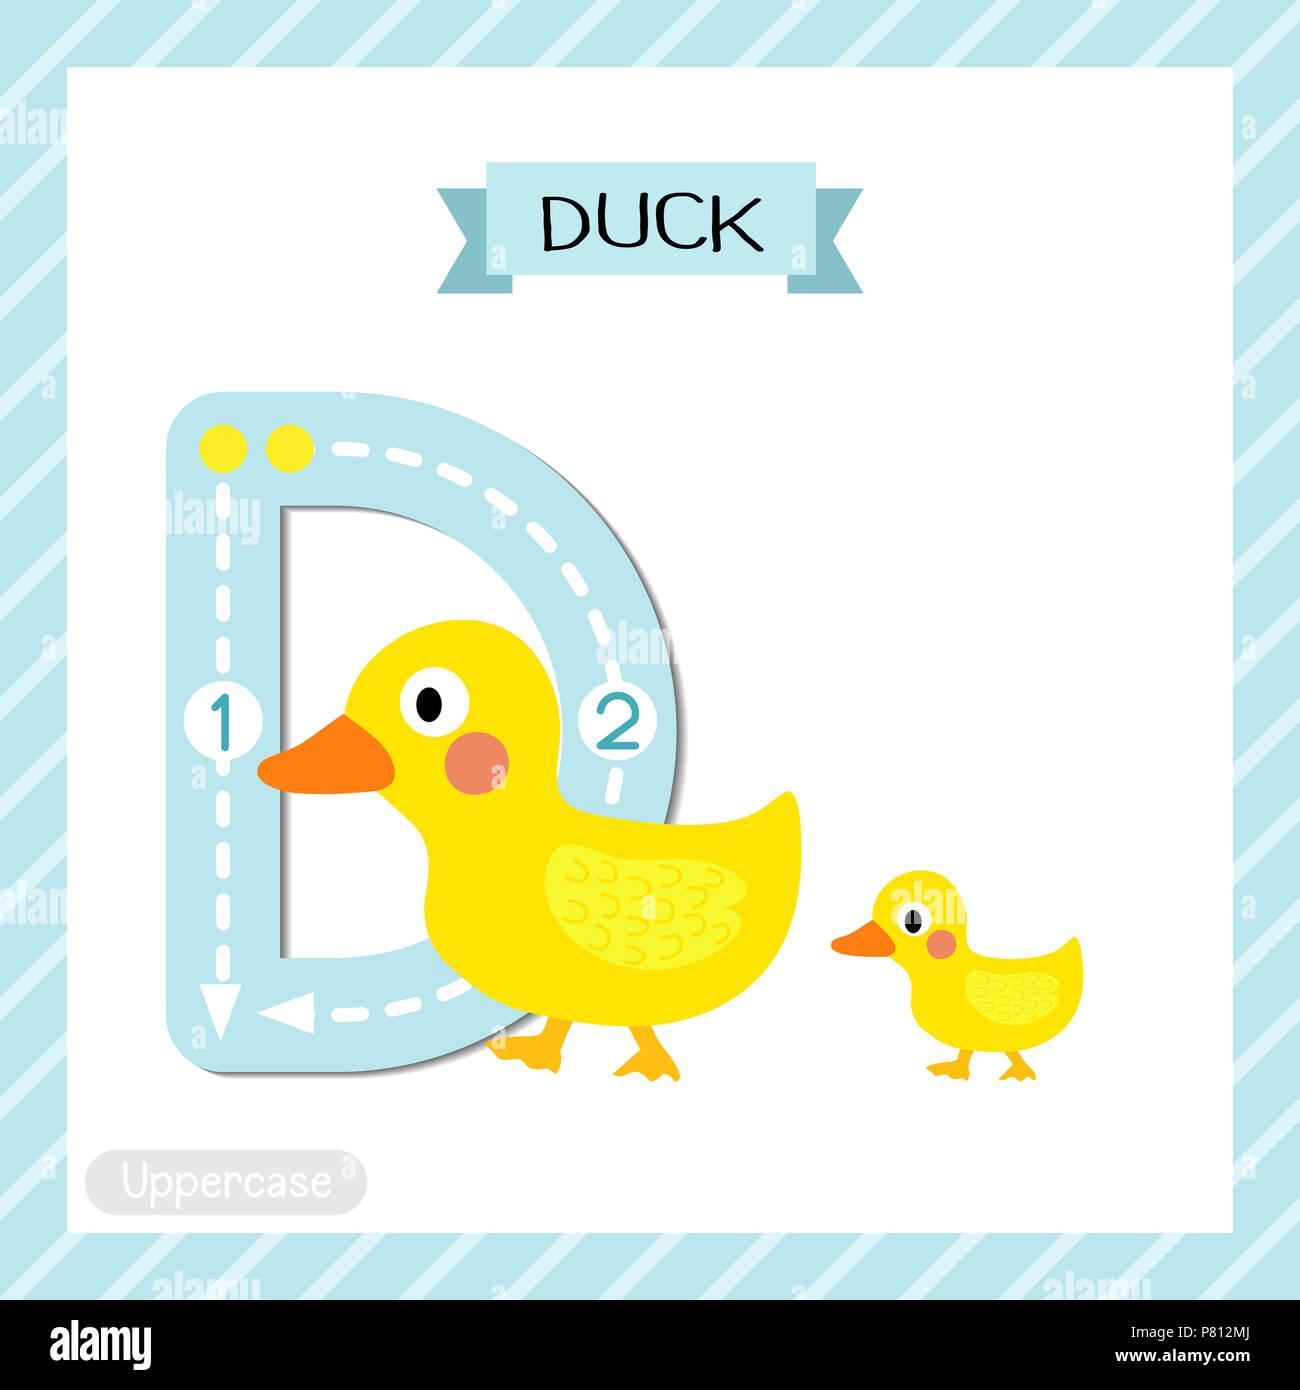 Vocabulario Animales Fashcards Ingles T Aprender